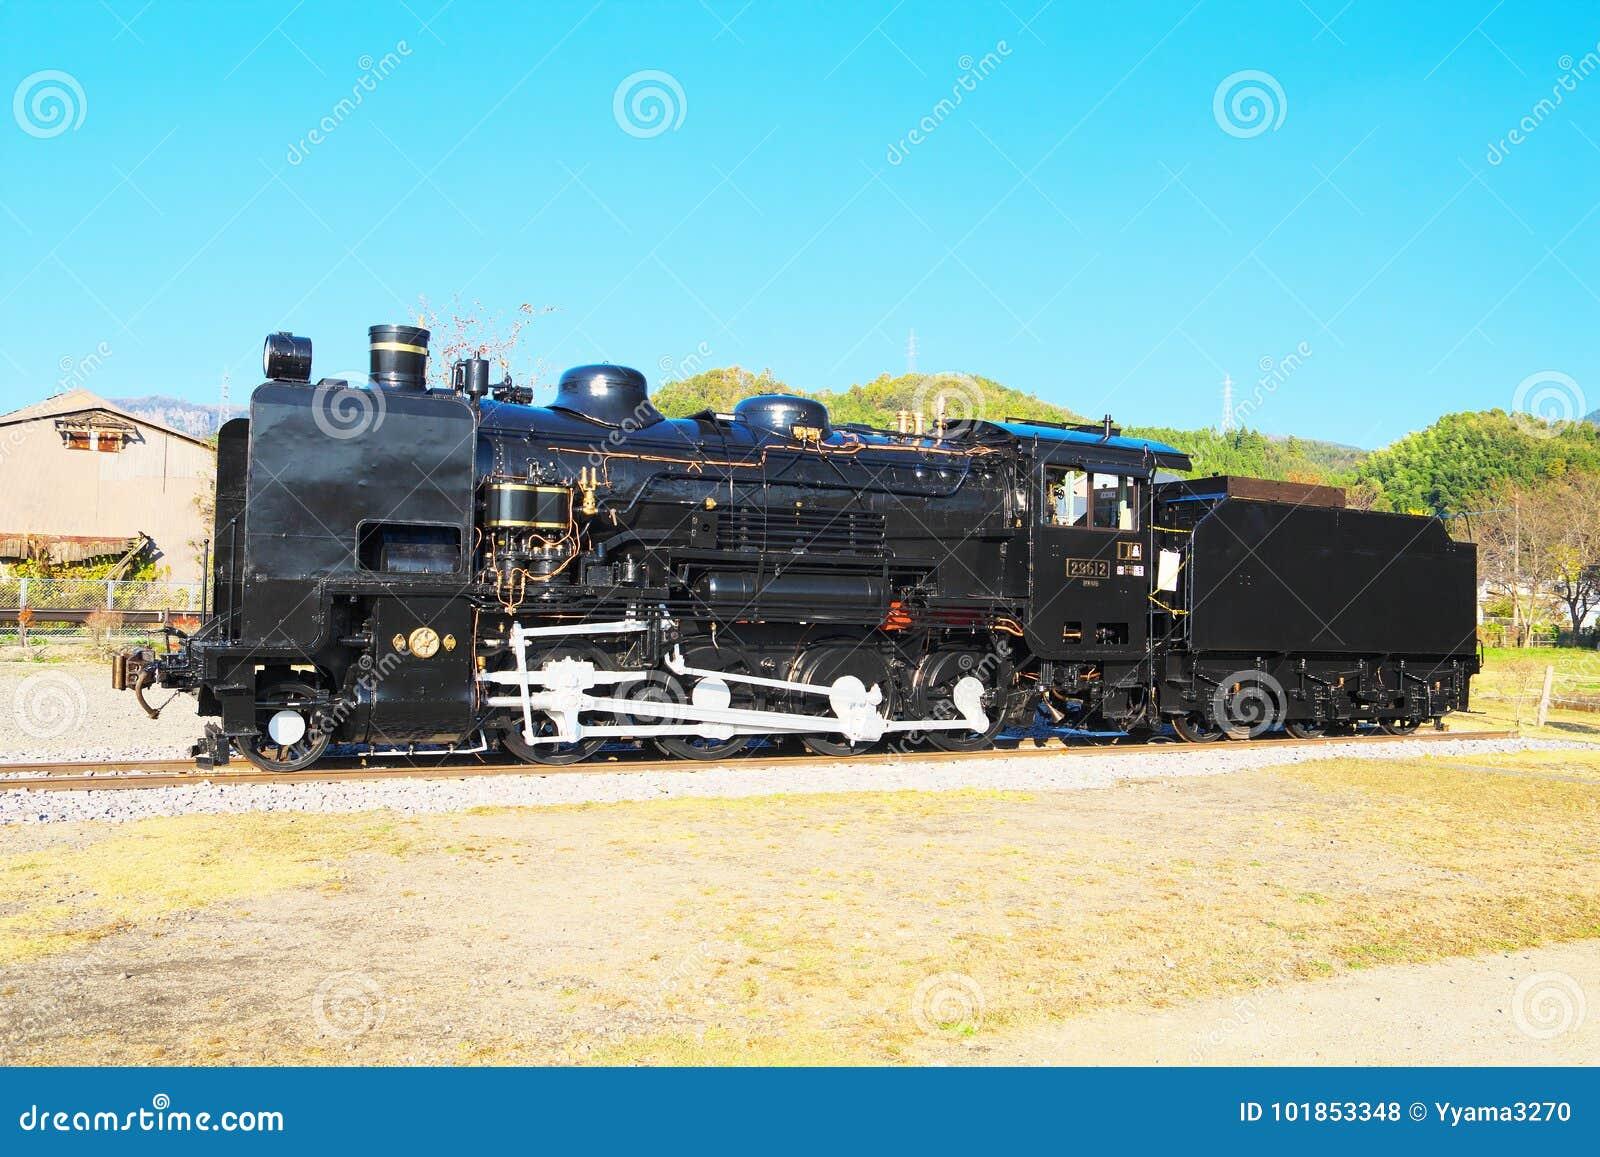 The Steam Locomotive Of JNR Class 9600 In Kusu, Oita, Japan